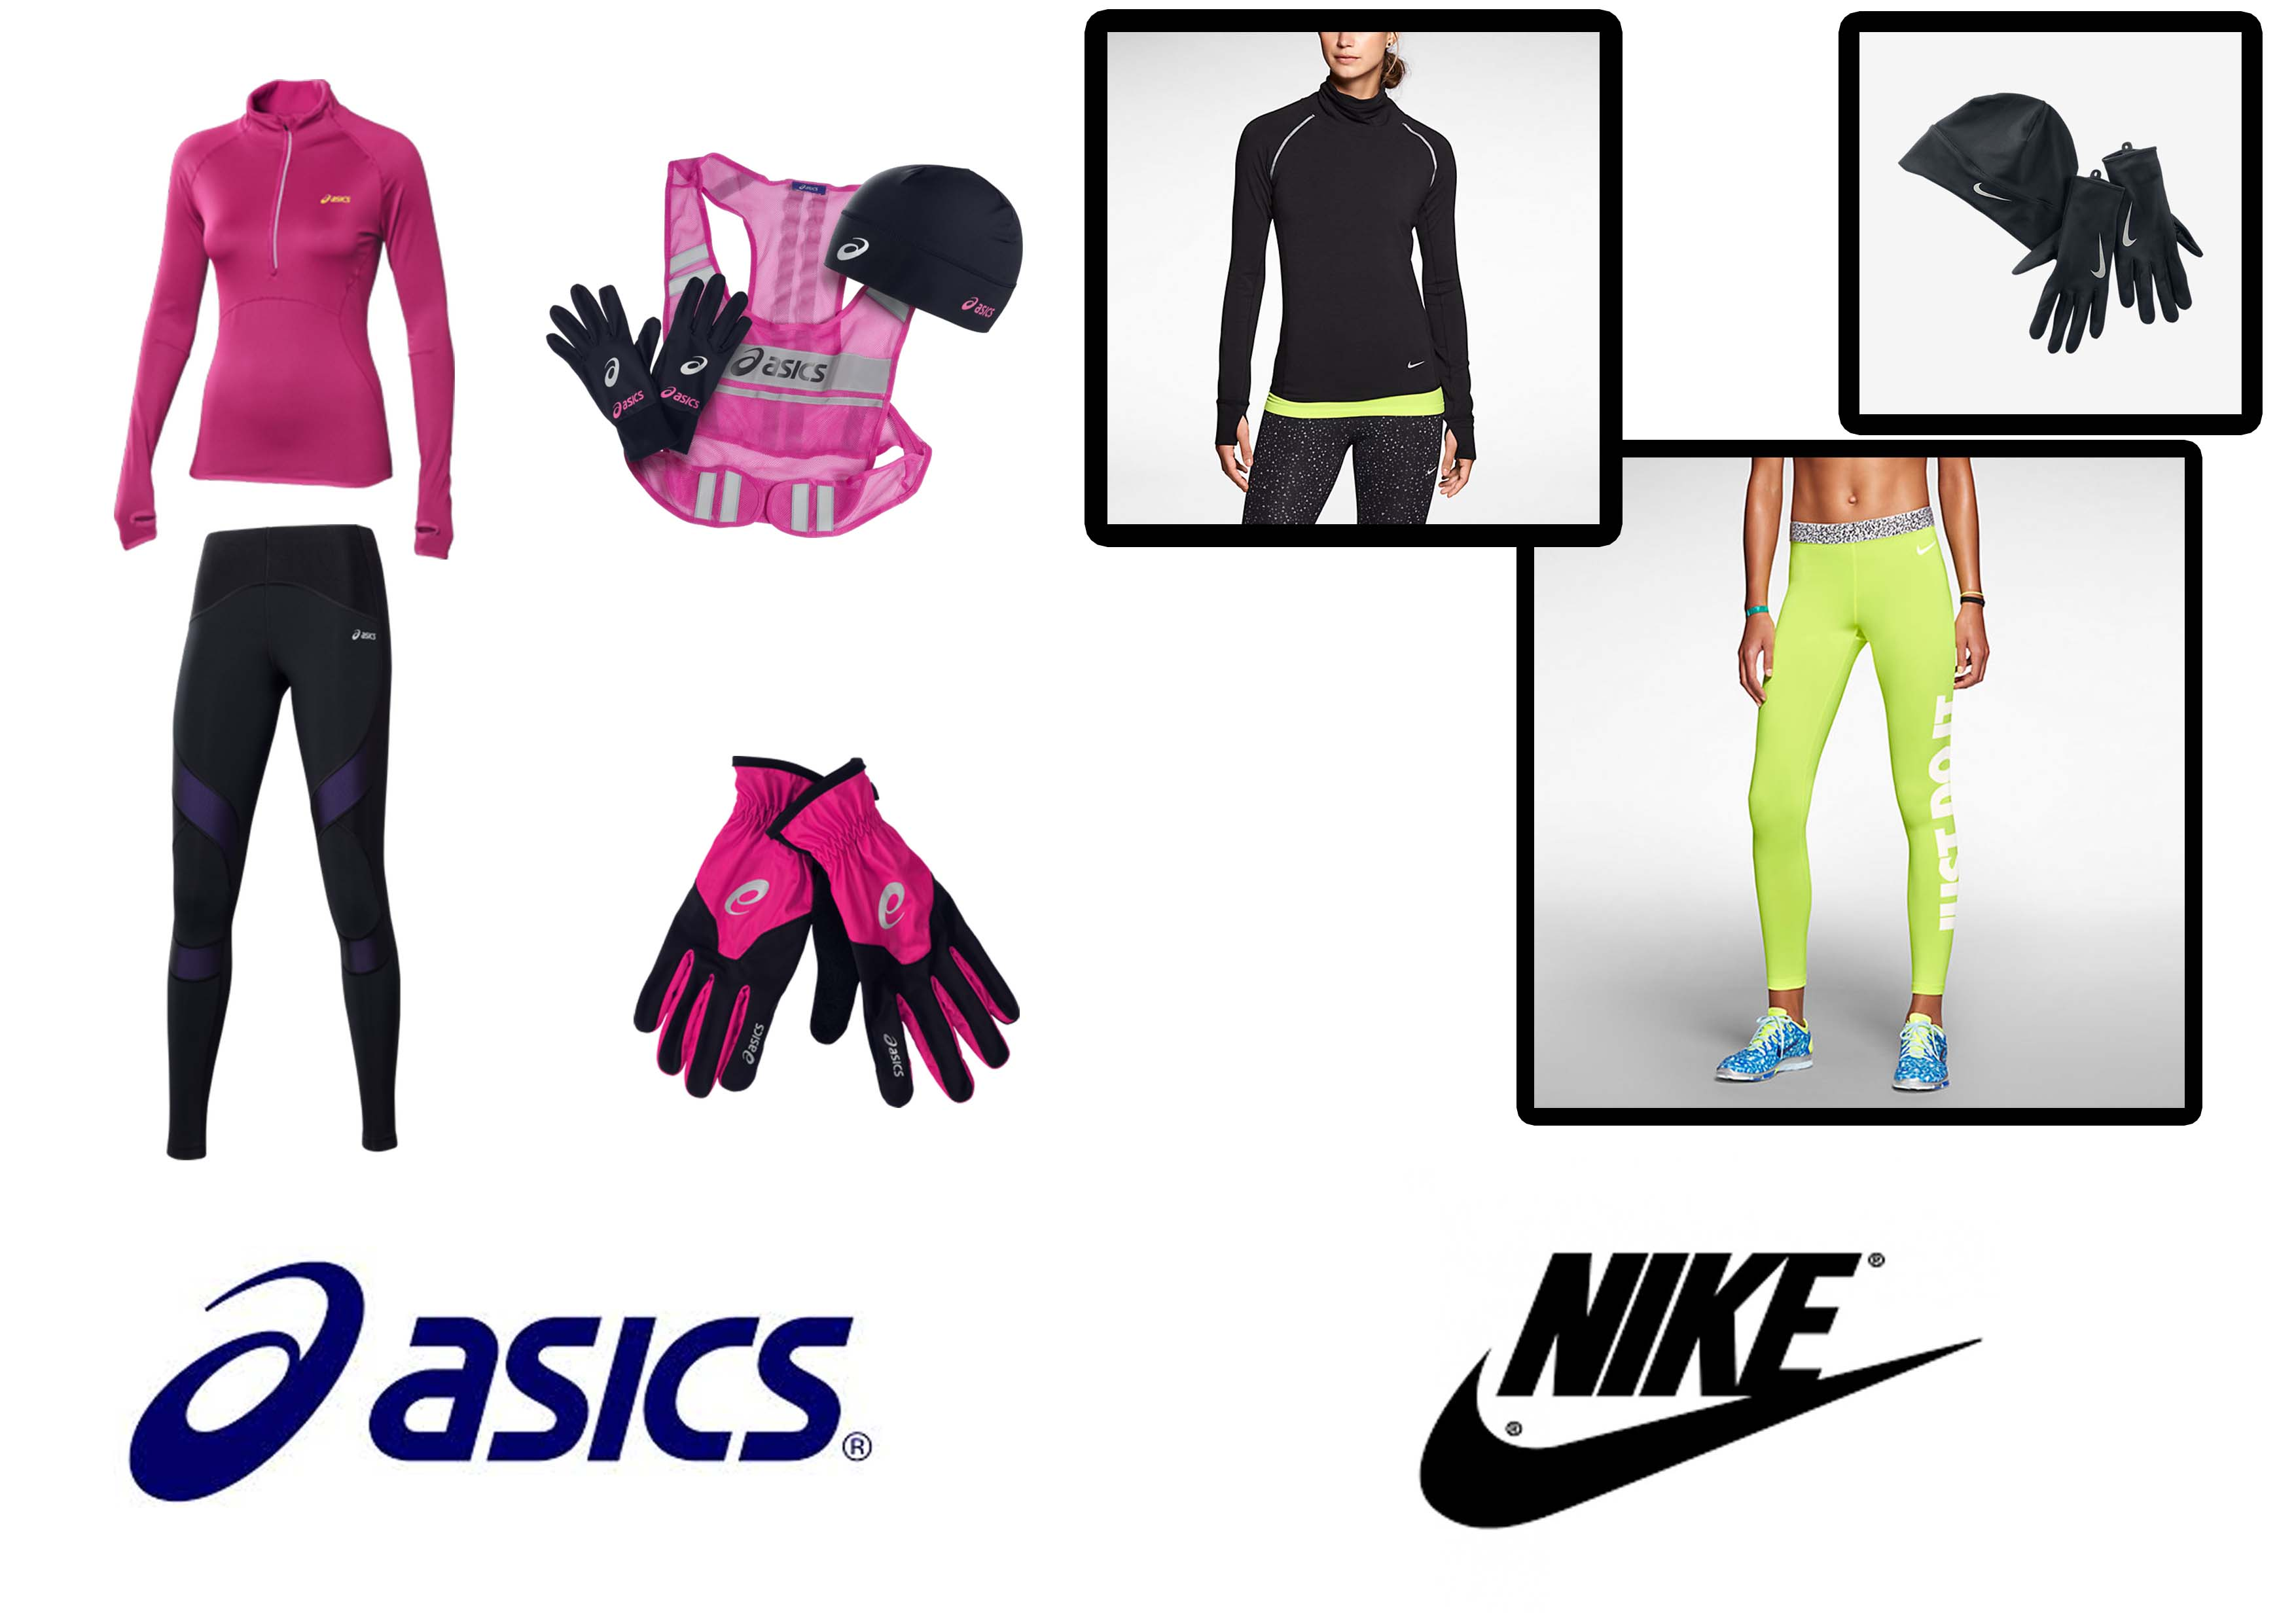 abbigliamento running donna nike